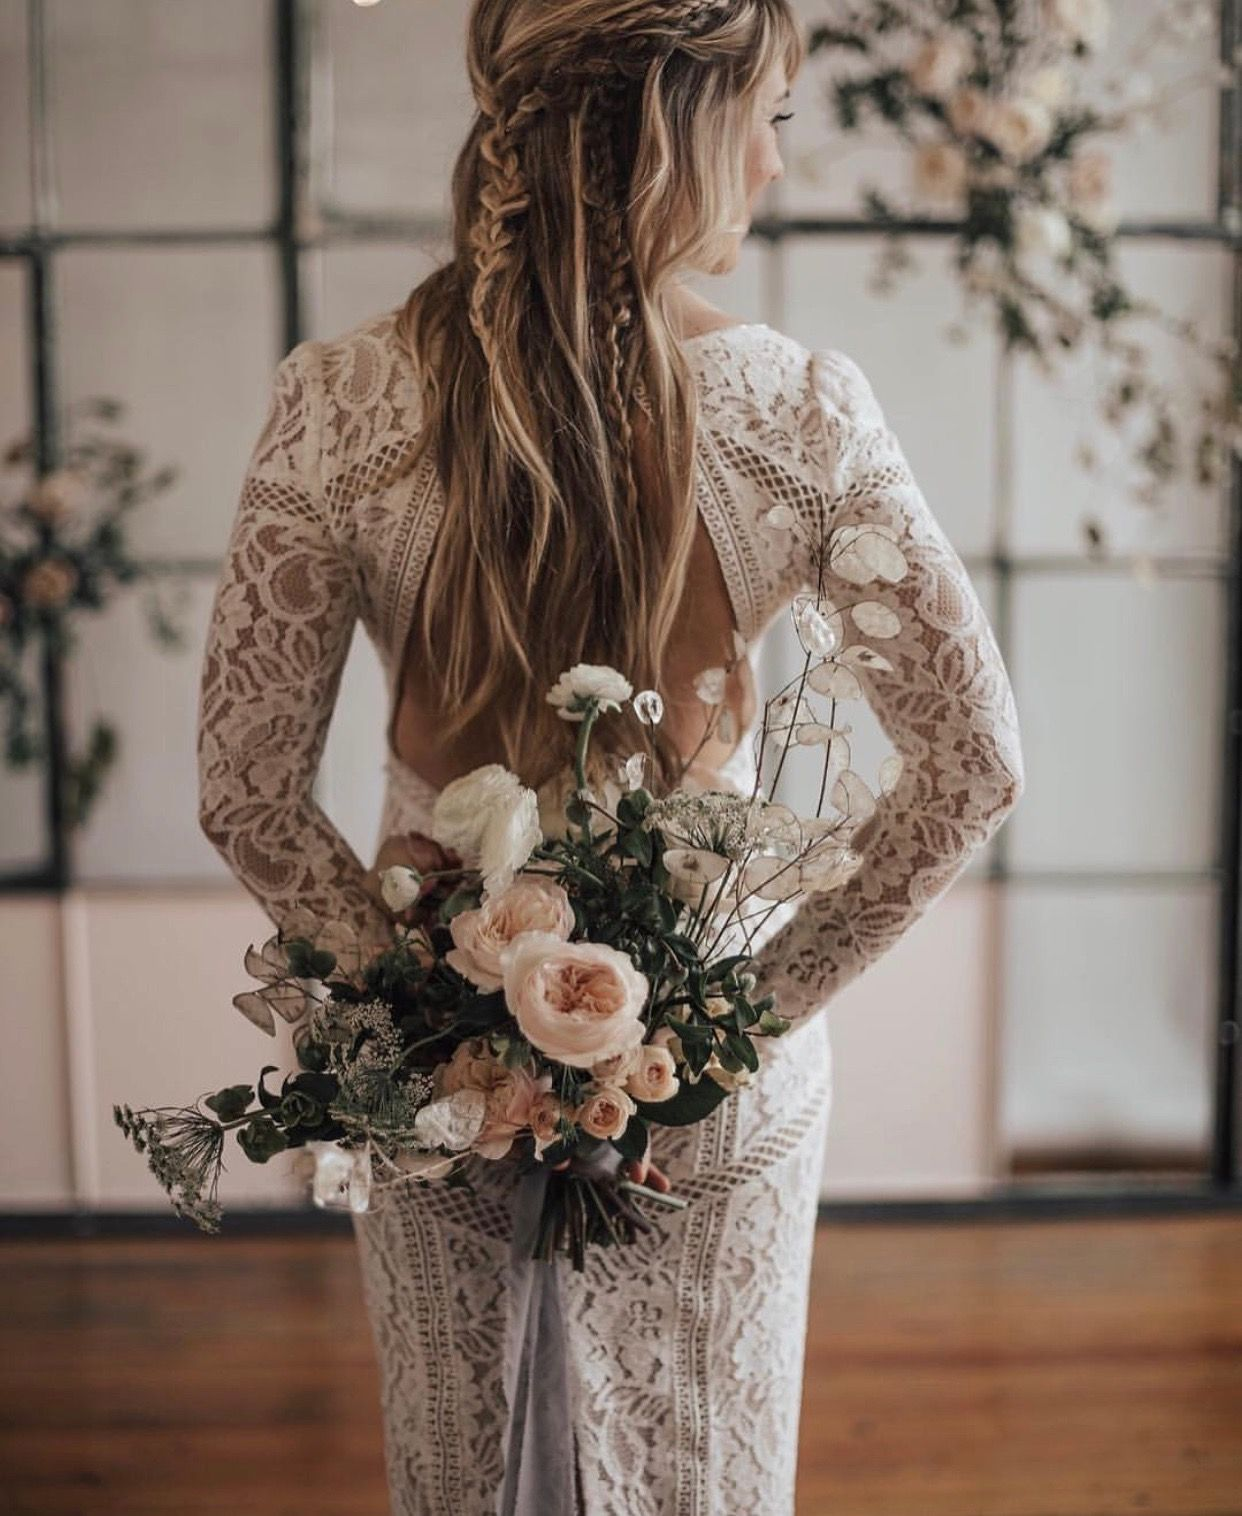 Pin by Amanda Schneider on WEDDINGS Wedding dresses